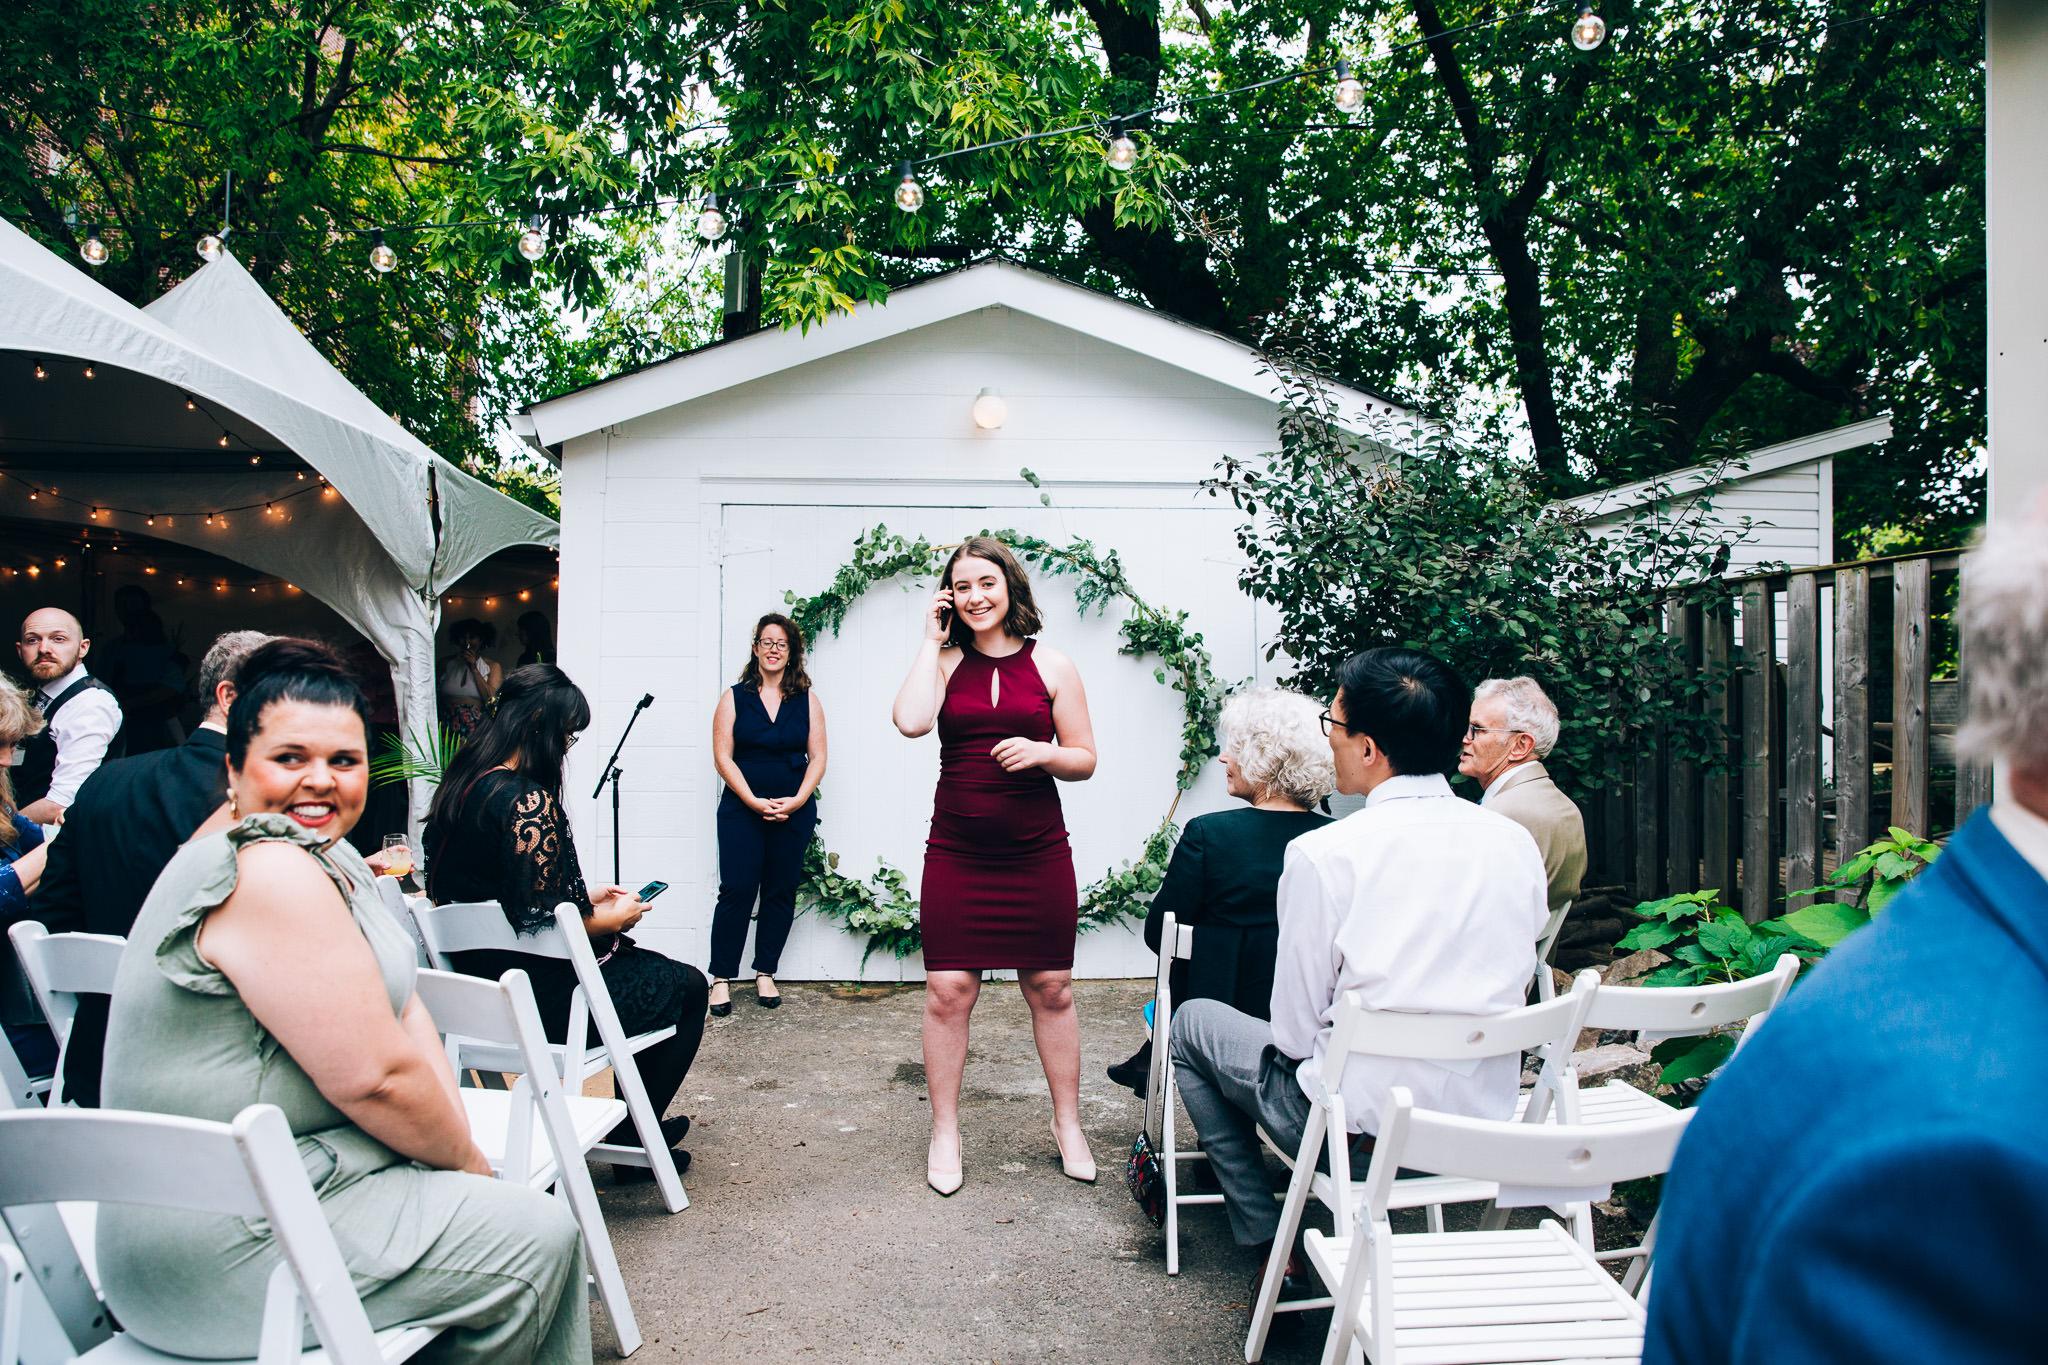 037_Canada-documentary-wedding-photograp